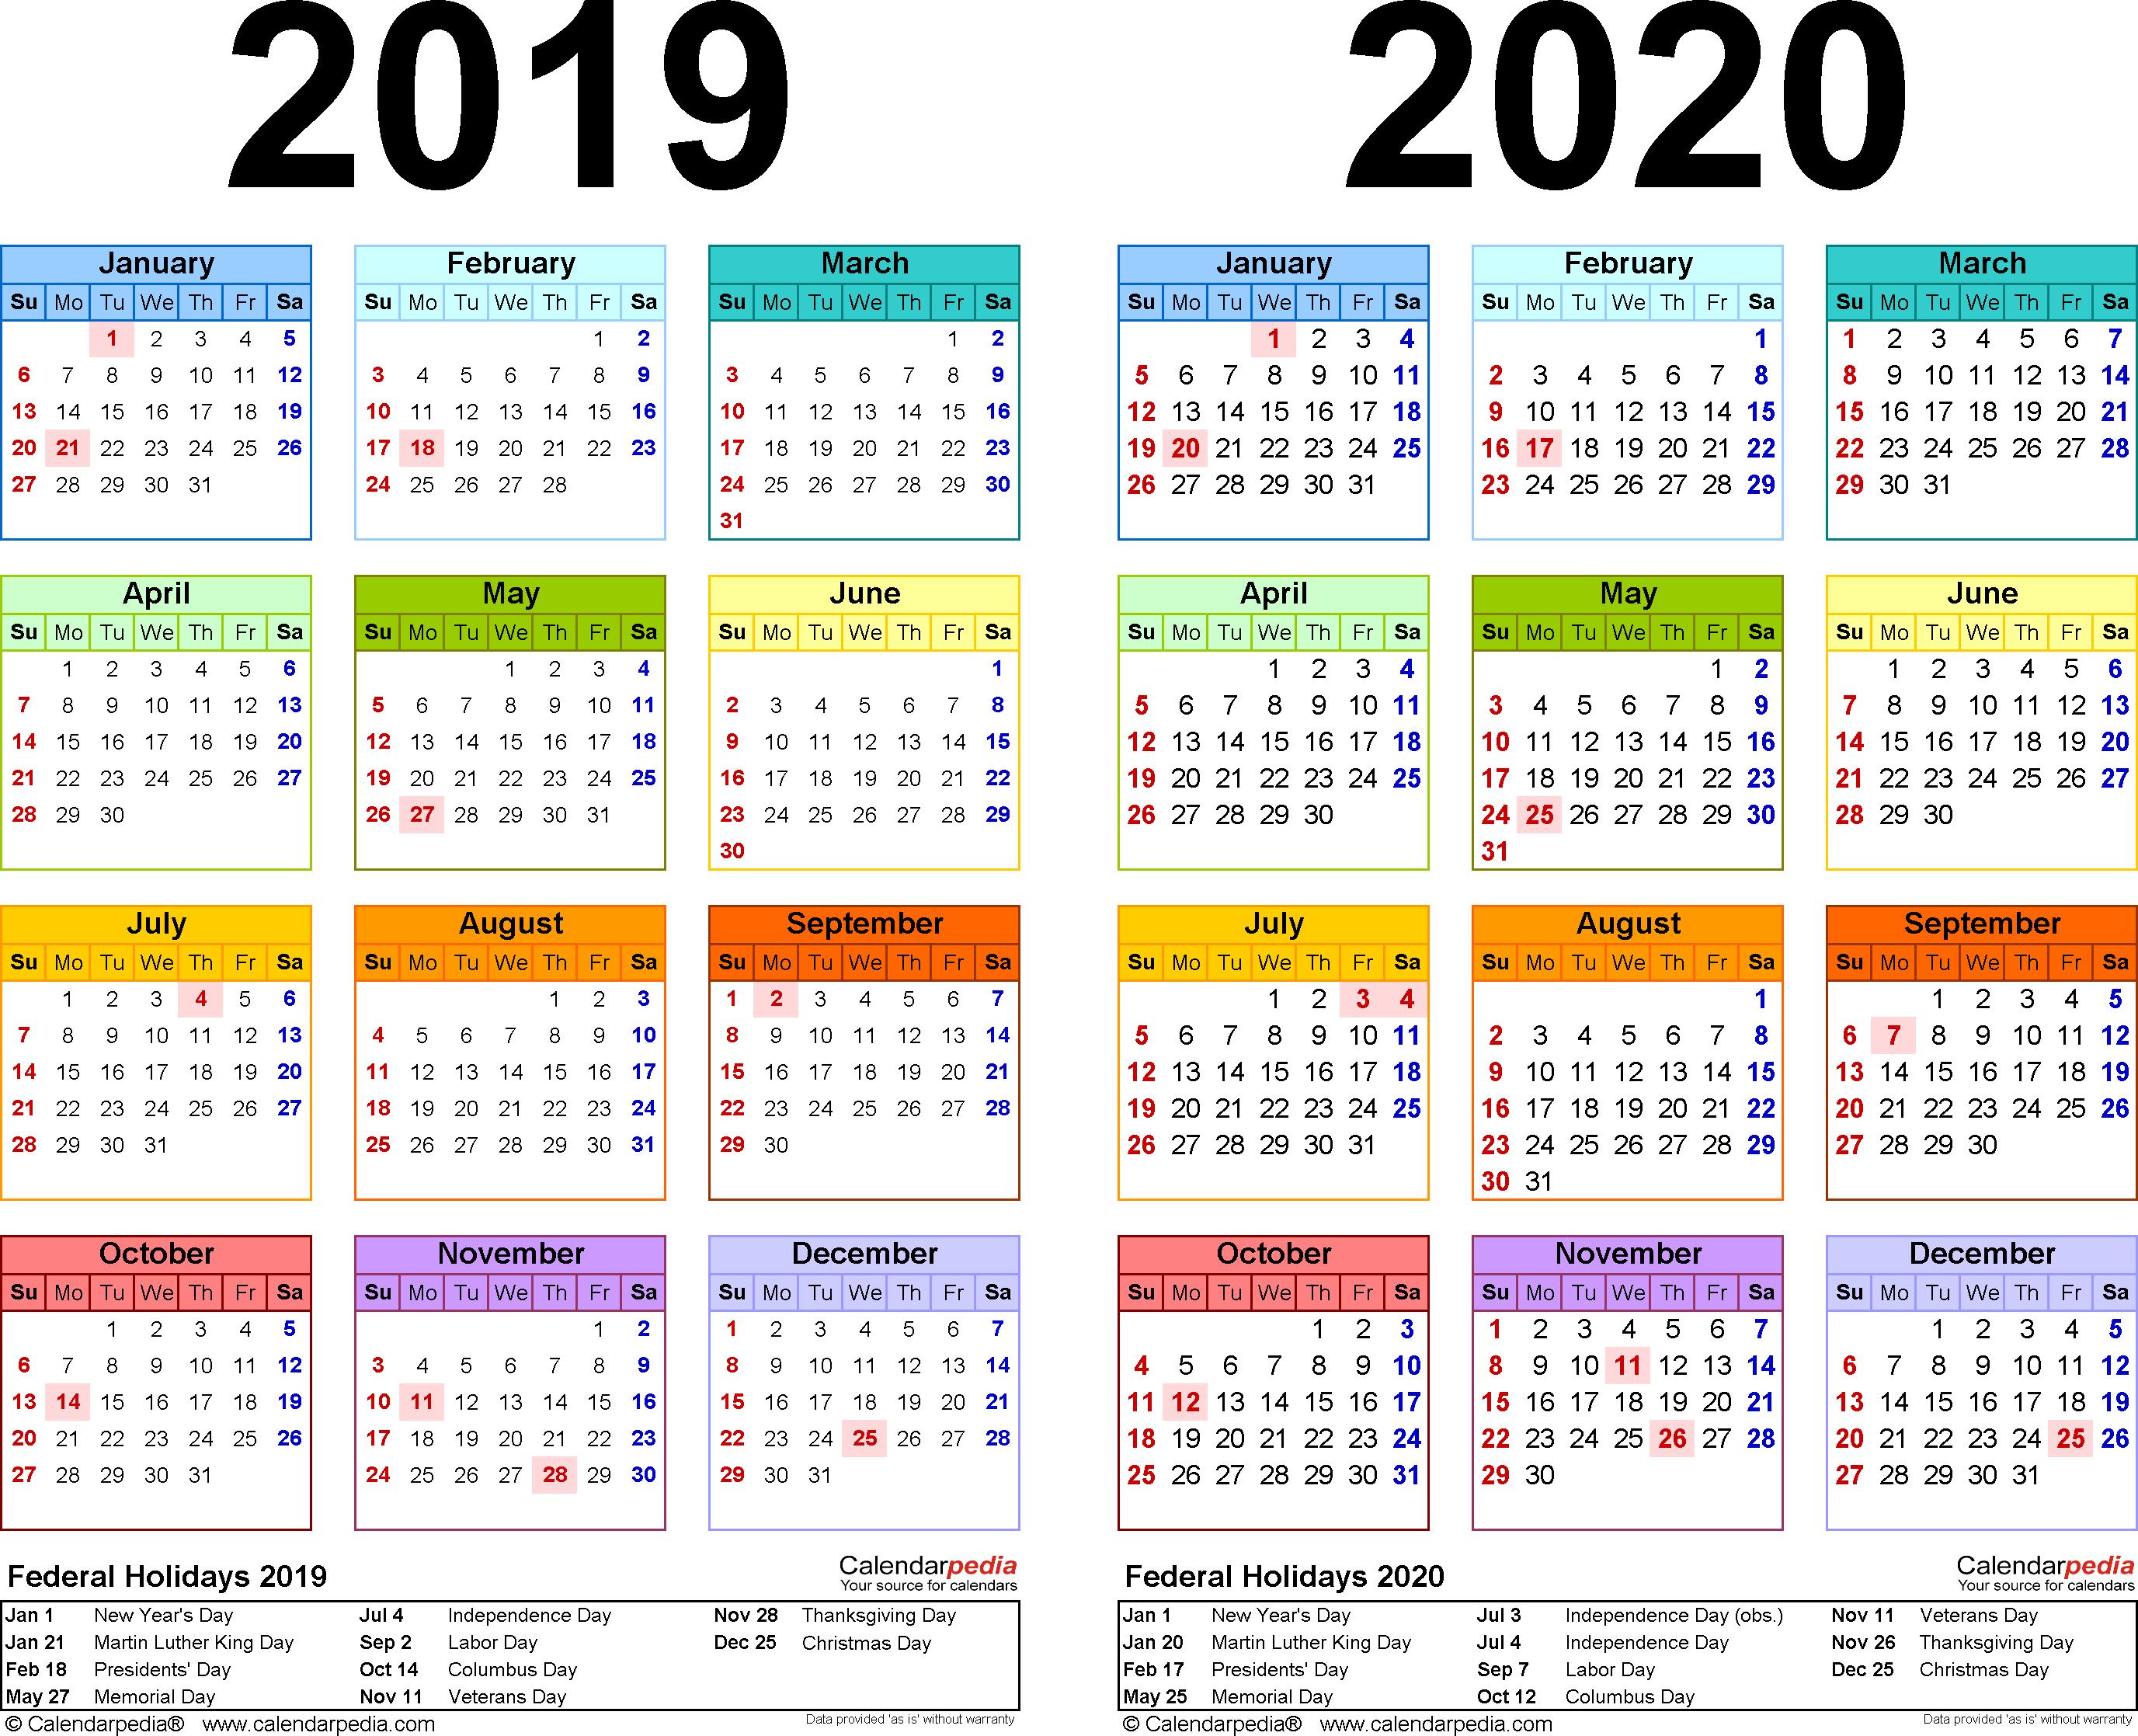 Printable Calendar 2019 And 2020 | Printable Calendar 2019 throughout 2020 Printable Calendar With Large Squares